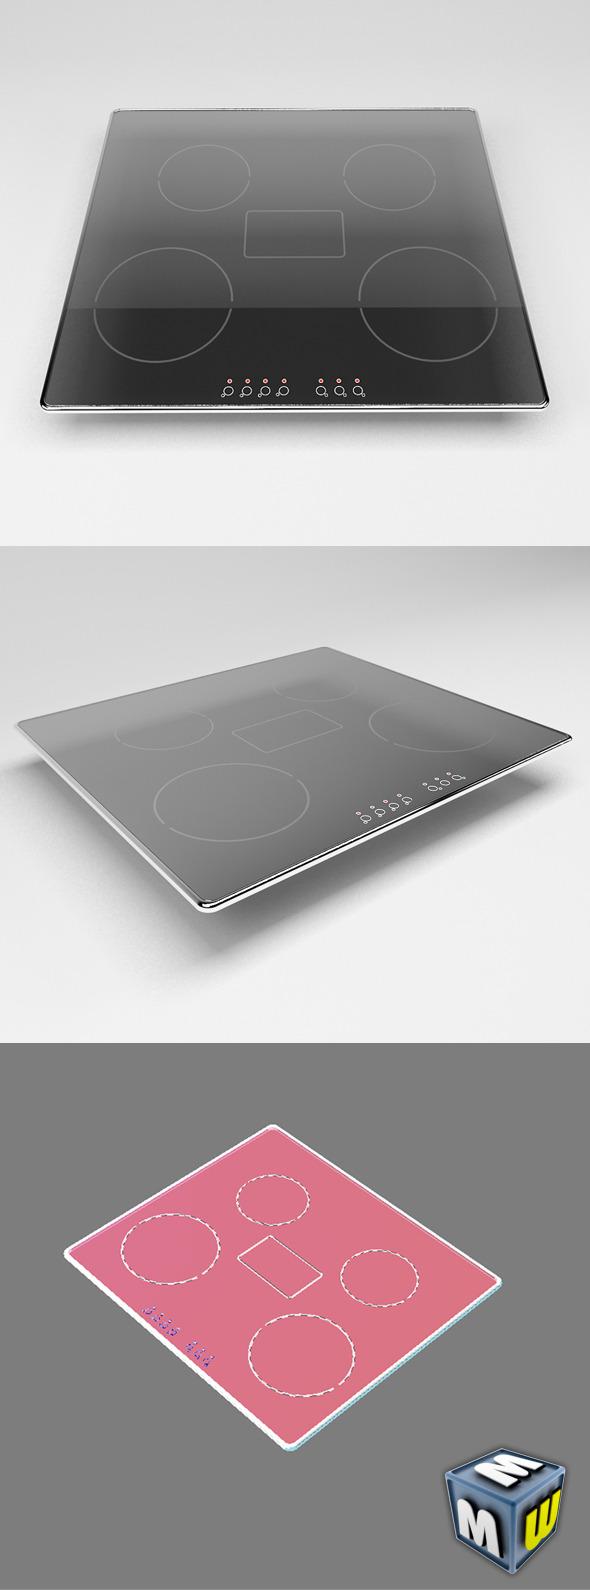 Oven CG Textures & 3D Models from 3DOcean